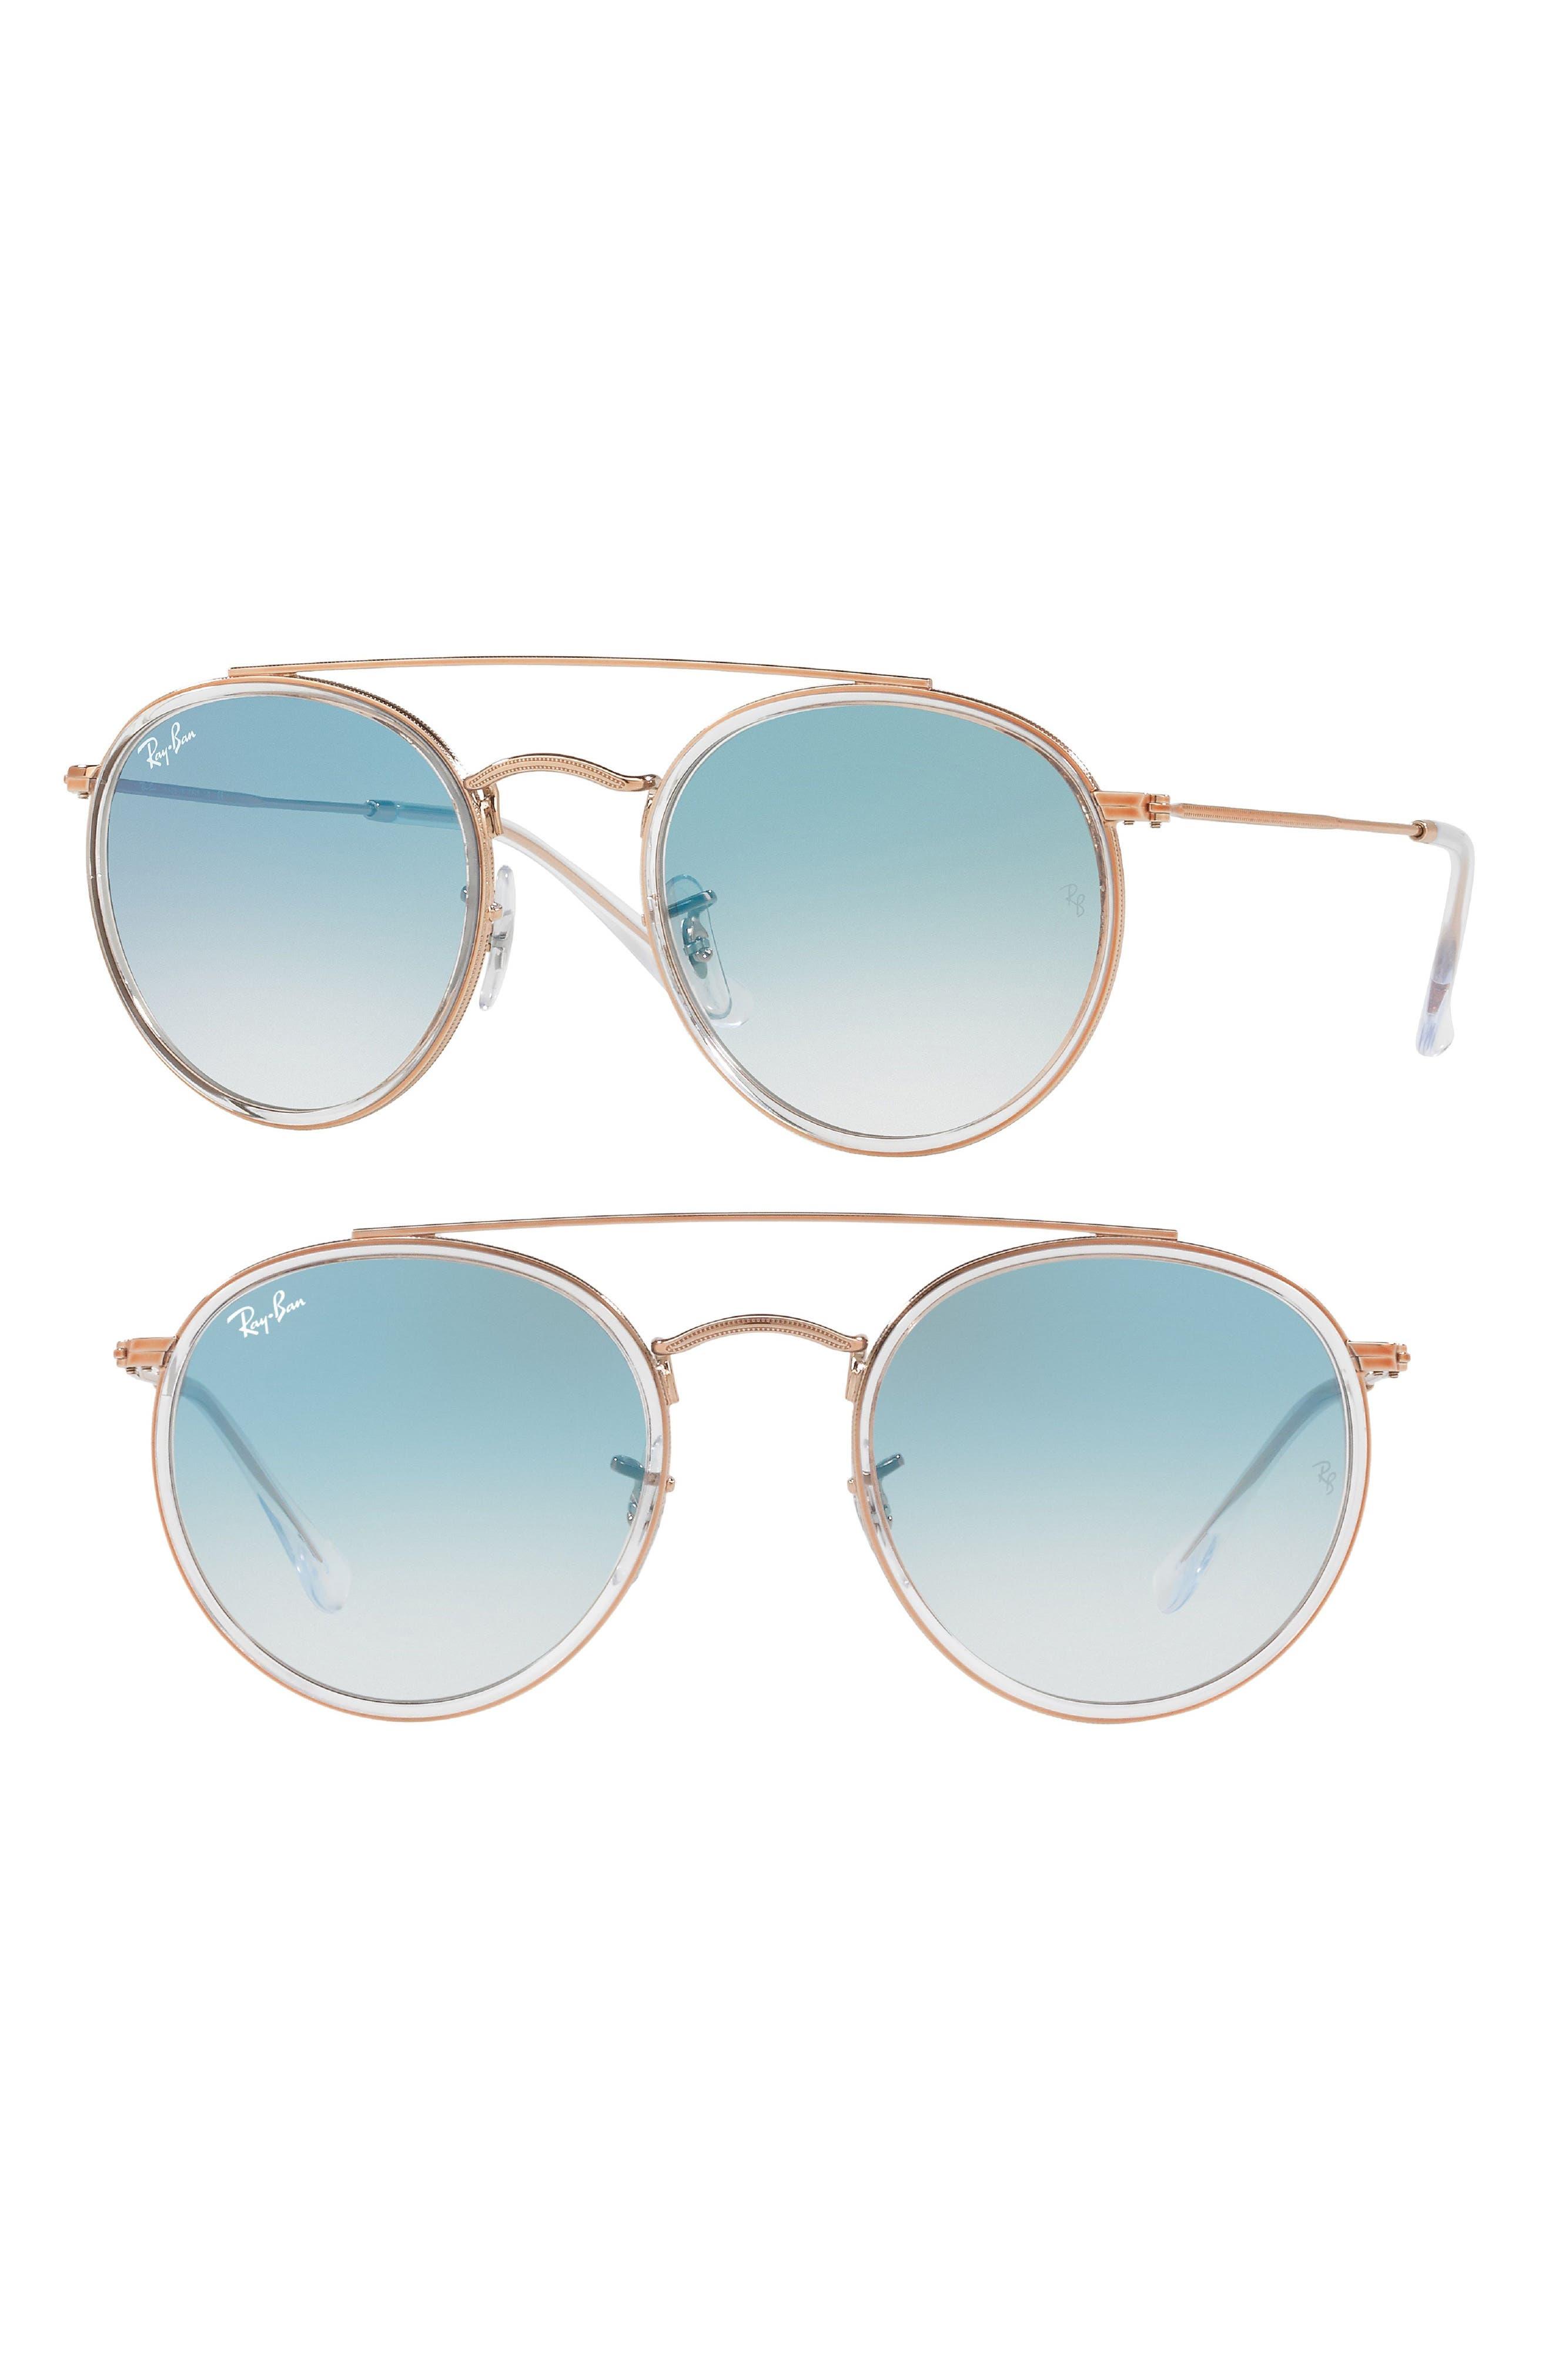 51mm Aviator Gradient Lens Sunglasses,                             Main thumbnail 2, color,